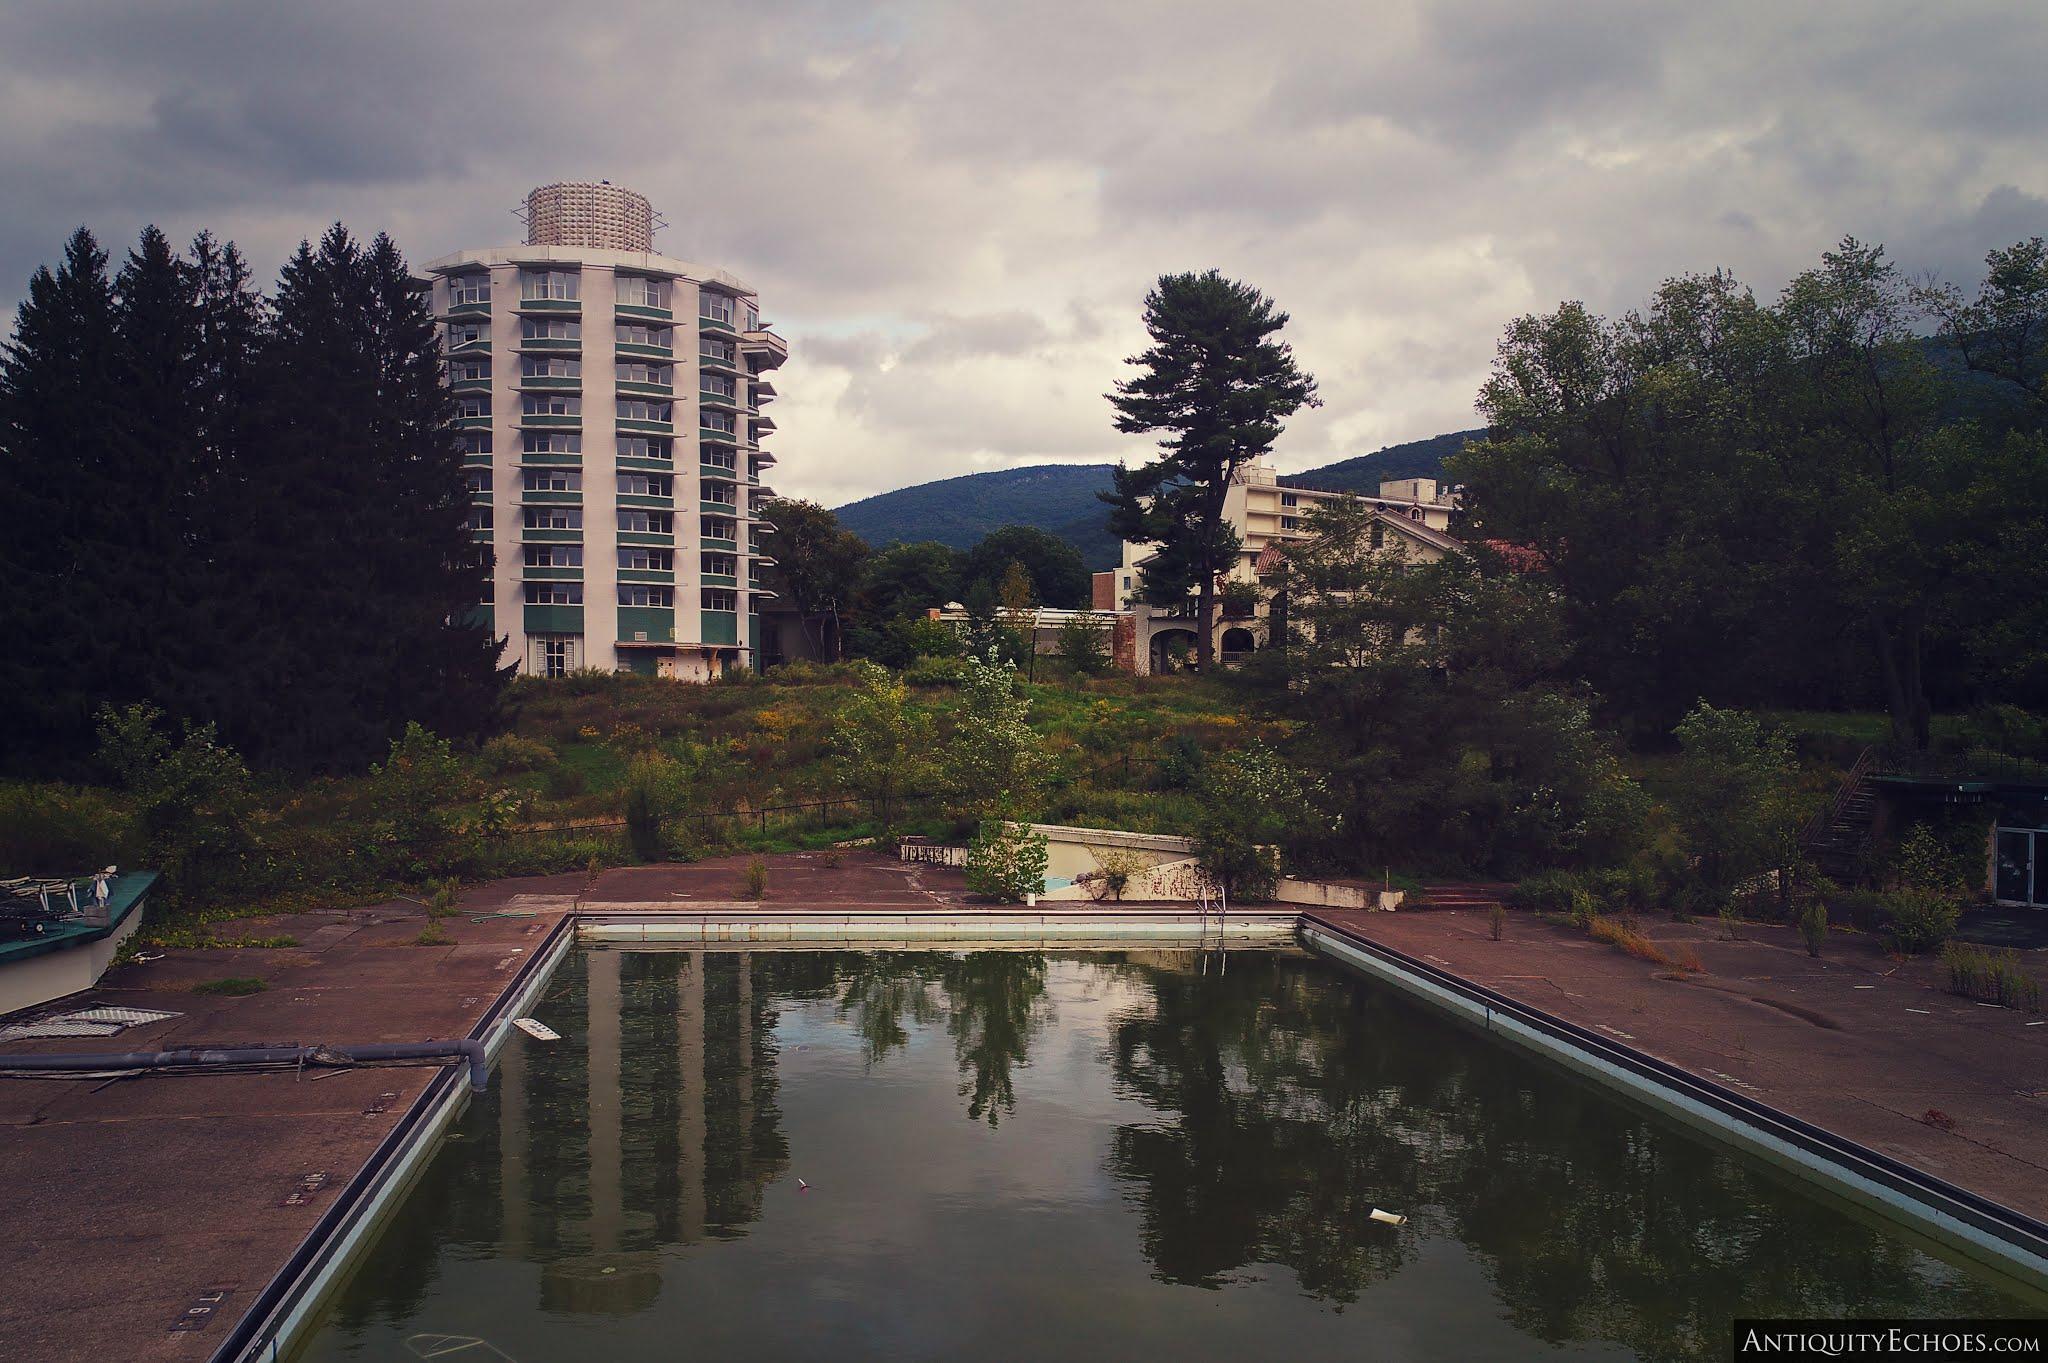 Nevele Grande - Stagnant Outdoor Pool